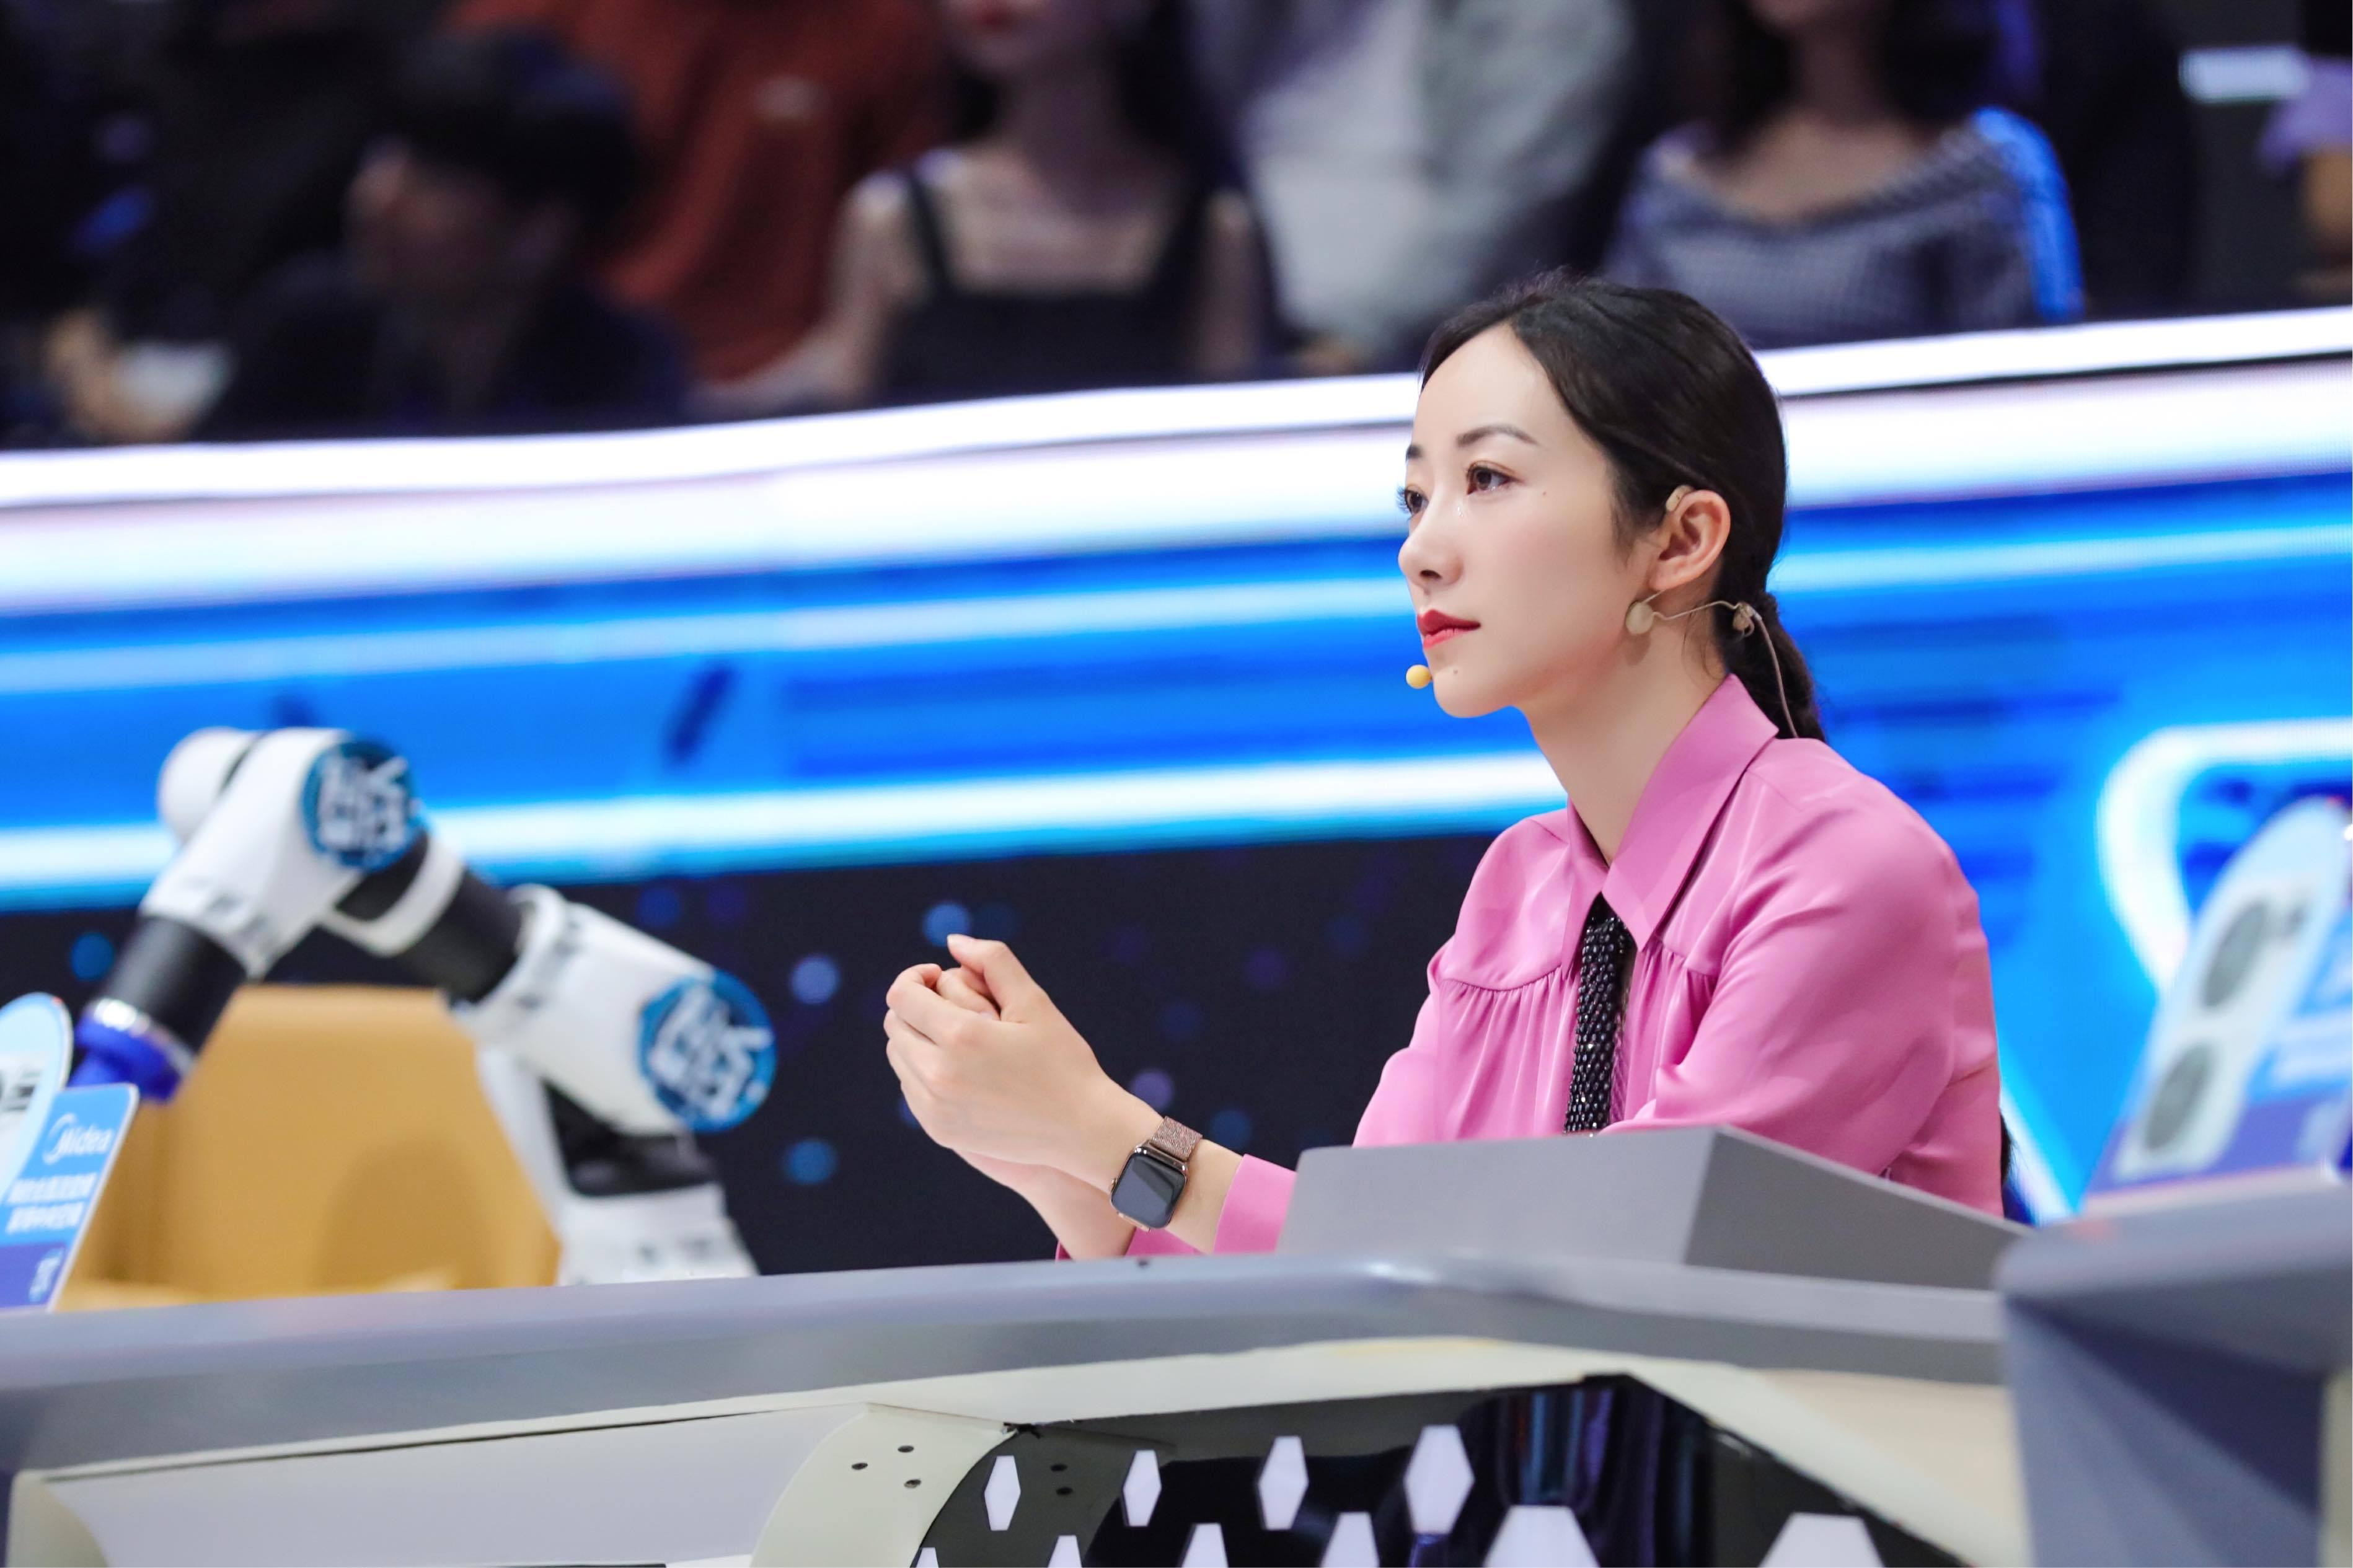 <b>韩雪CCTV1《机智过人》昨日开播 获新闻联播强势推荐</b>